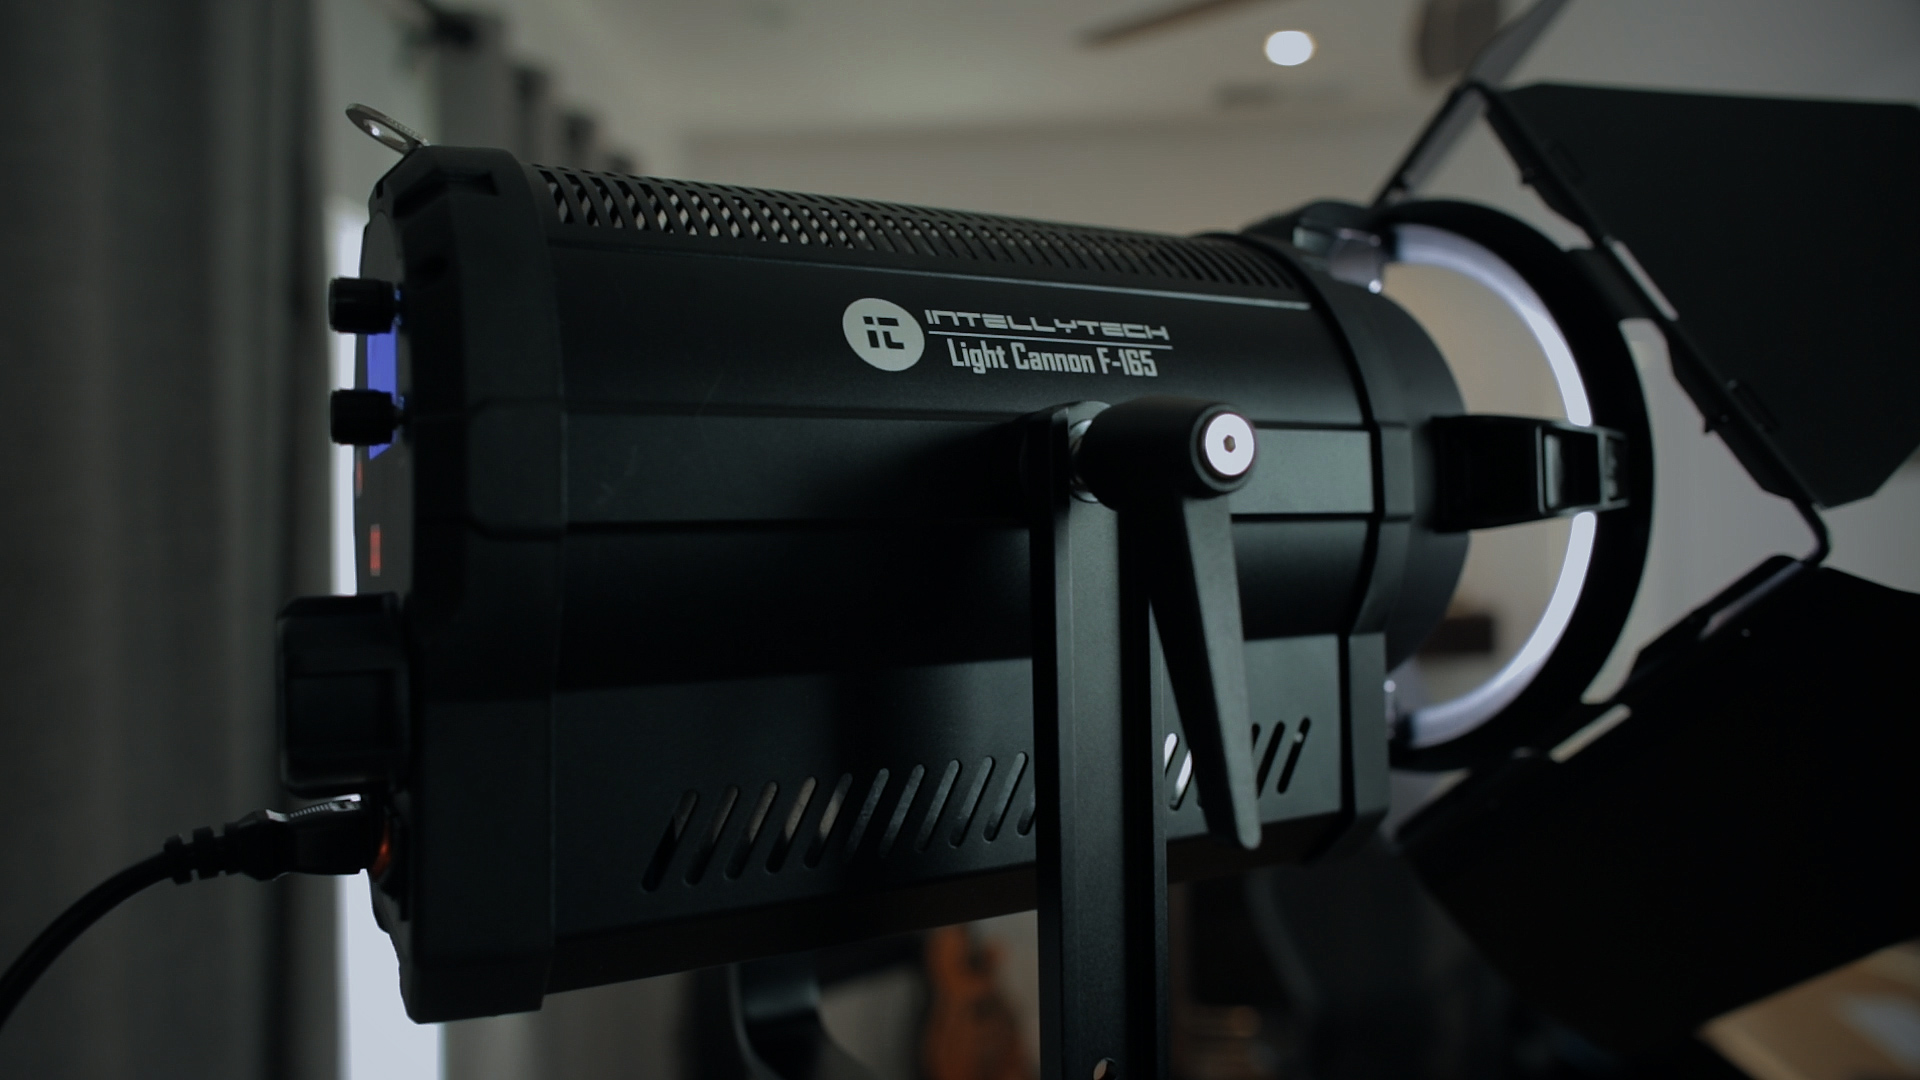 IntellyTech Light Cannon F-165